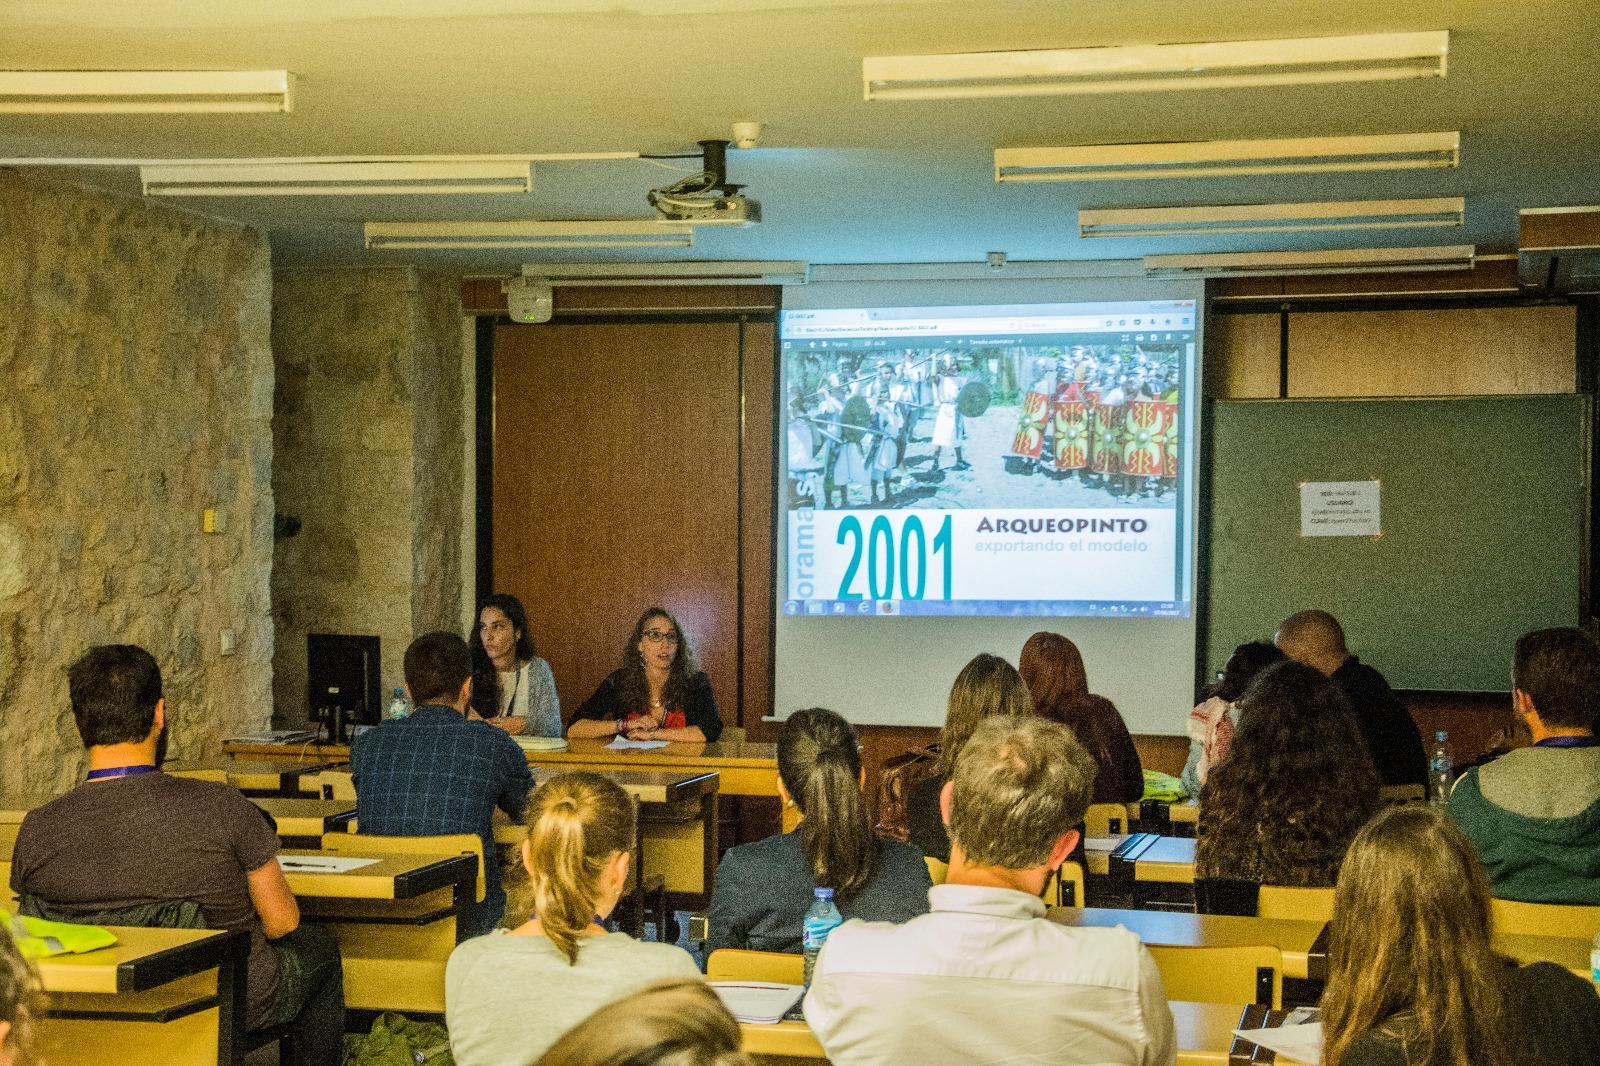 X jornadas de Jovenes investigadores JIA 2017 Burgos